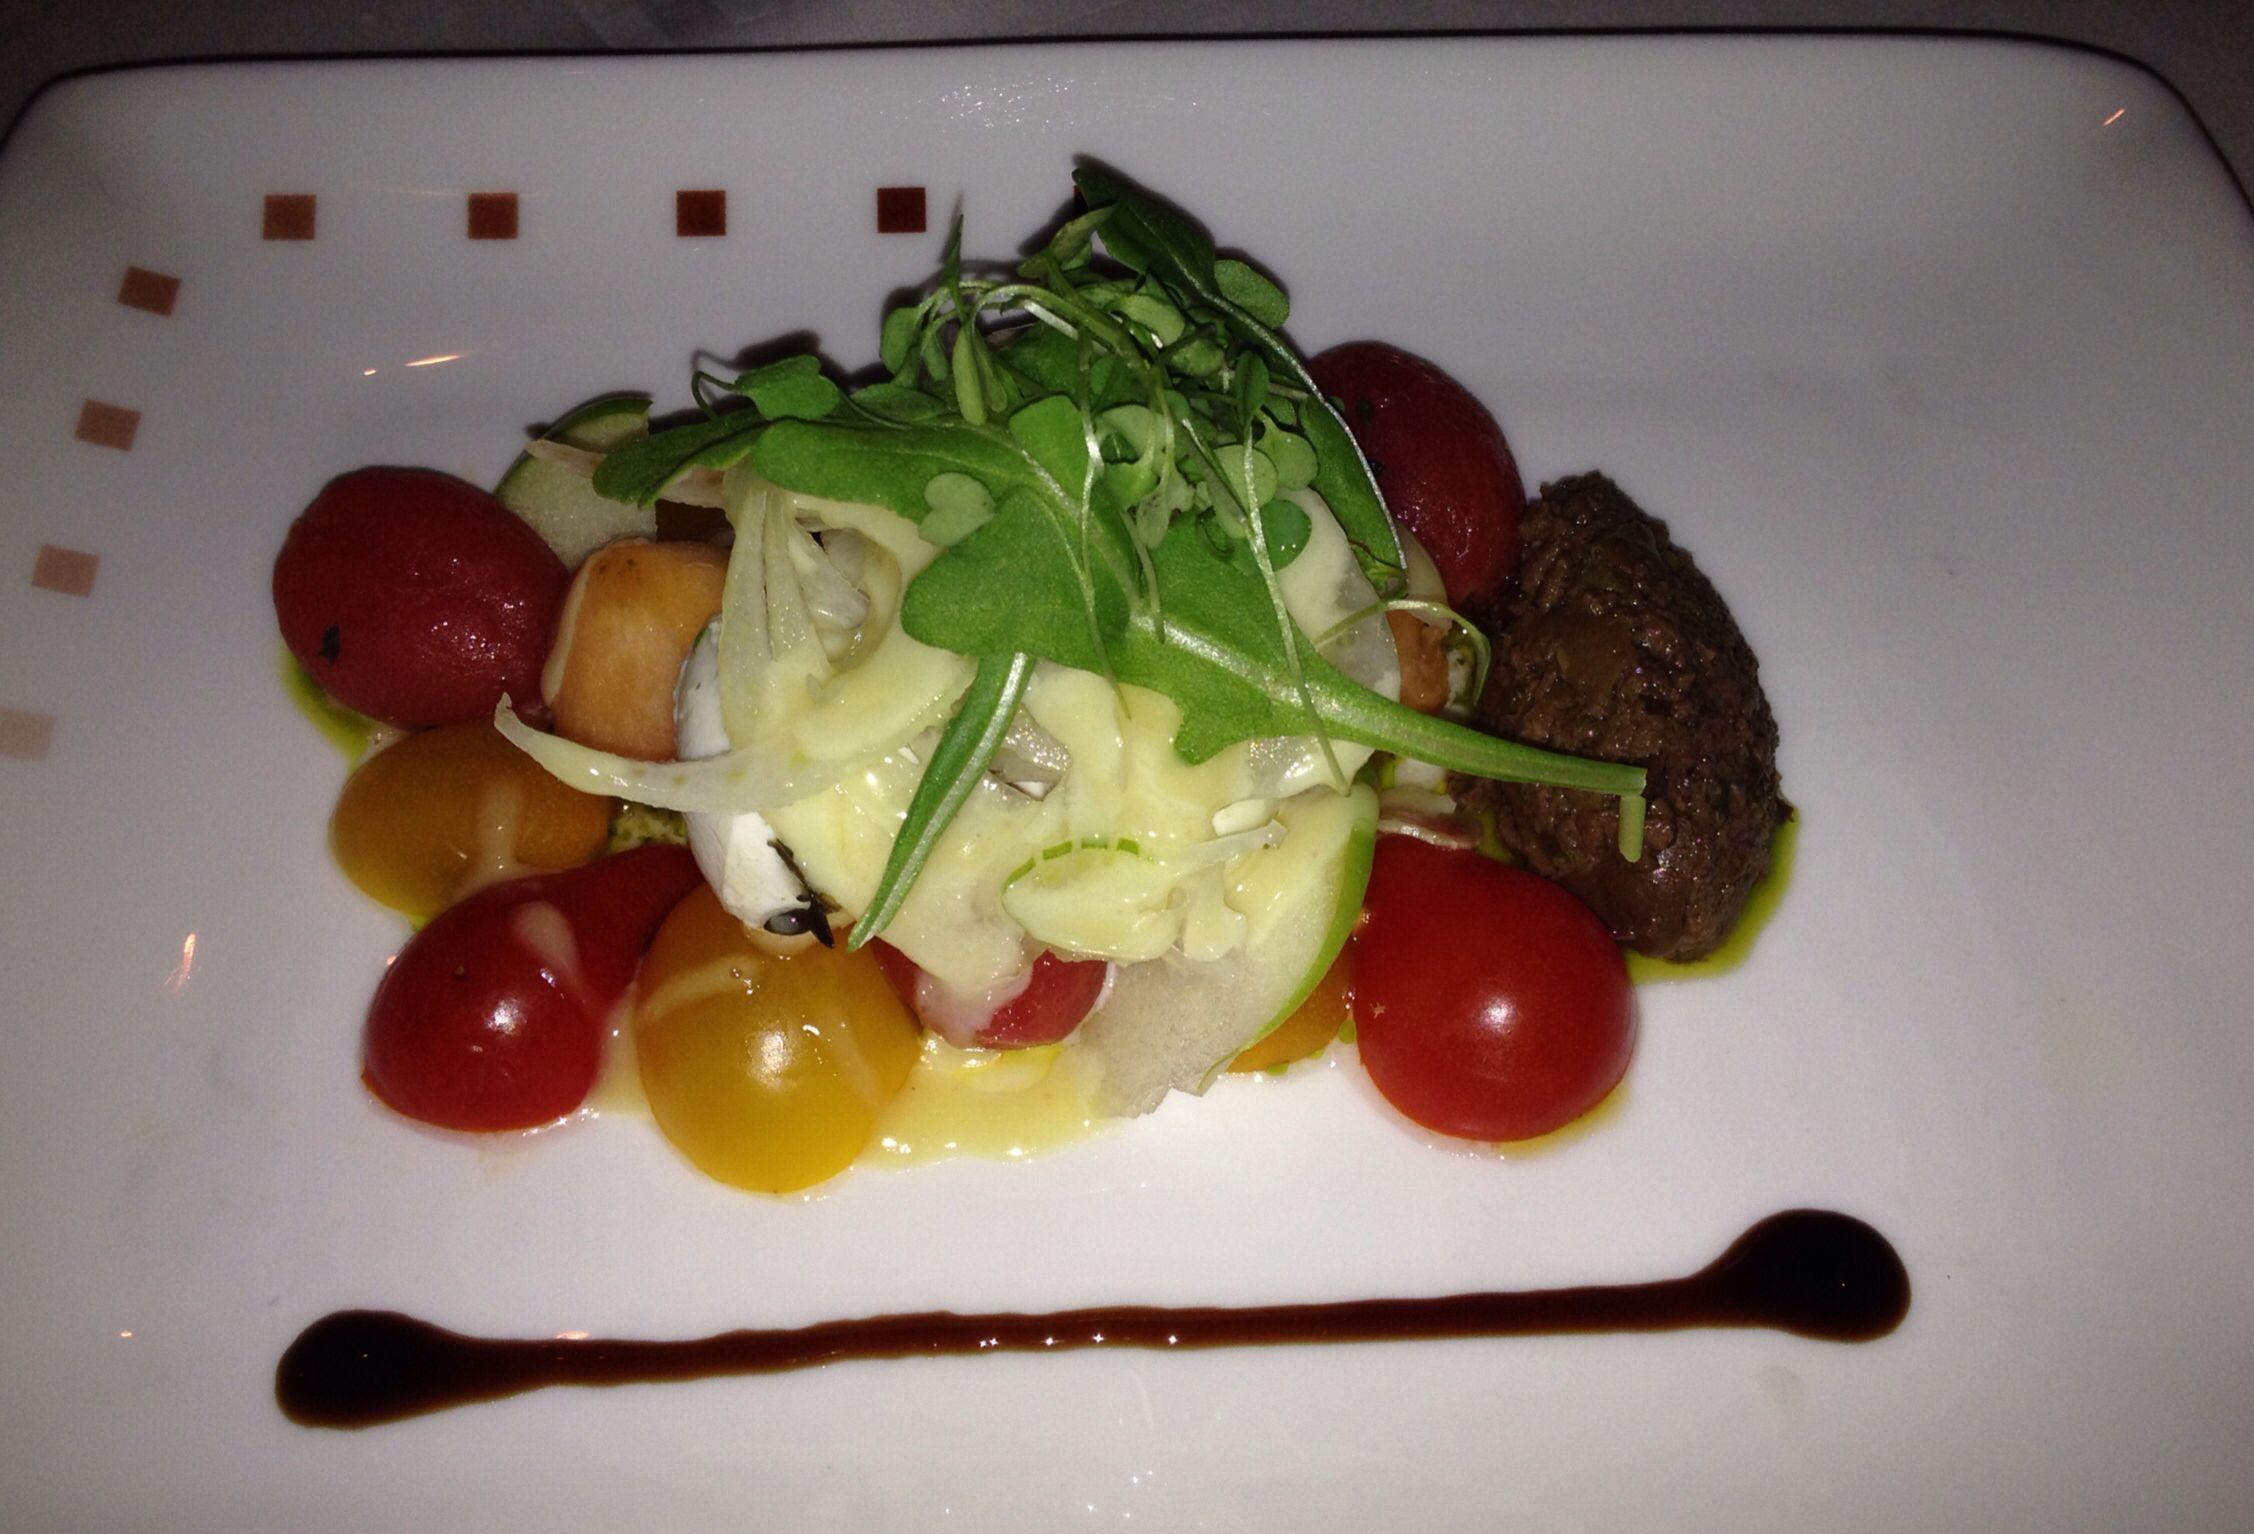 Cruise salad!